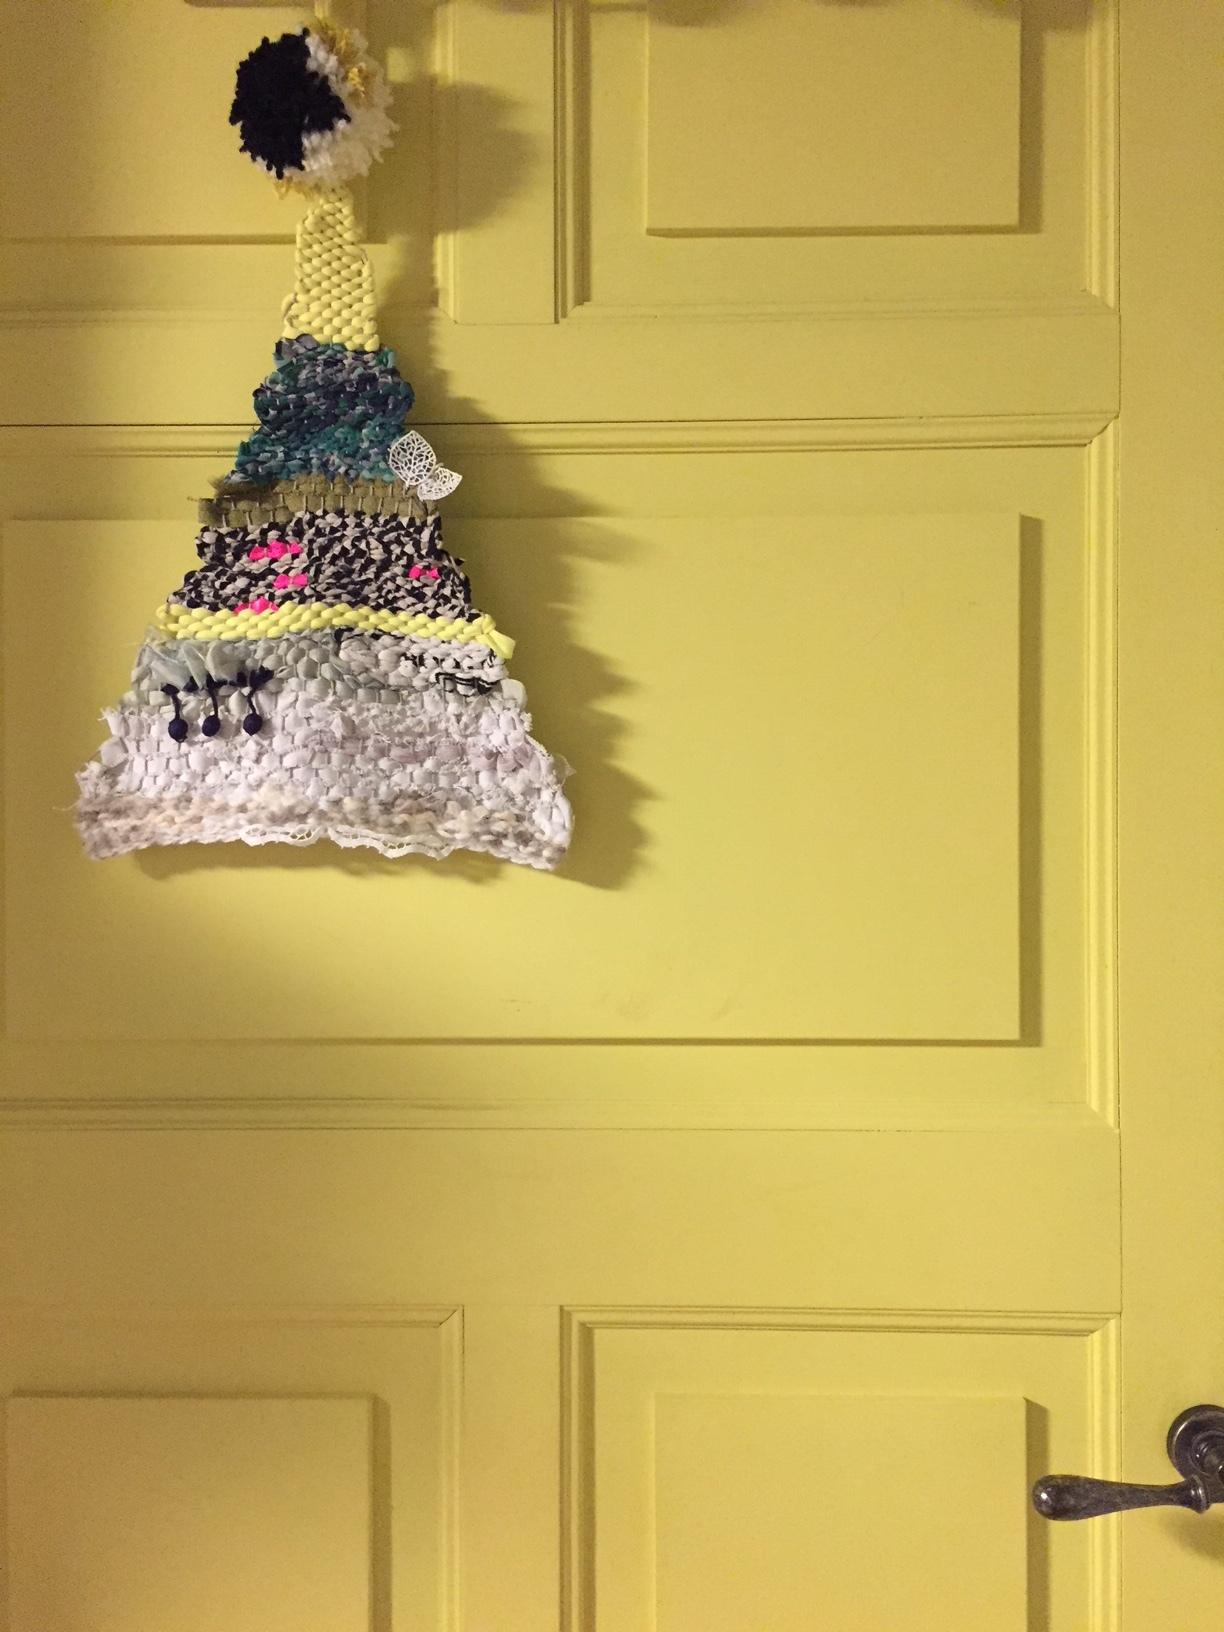 KAORI NONAKAさんとつくる                       『クリスマス タペストリーのワークショップ』_b0117913_17172908.jpg